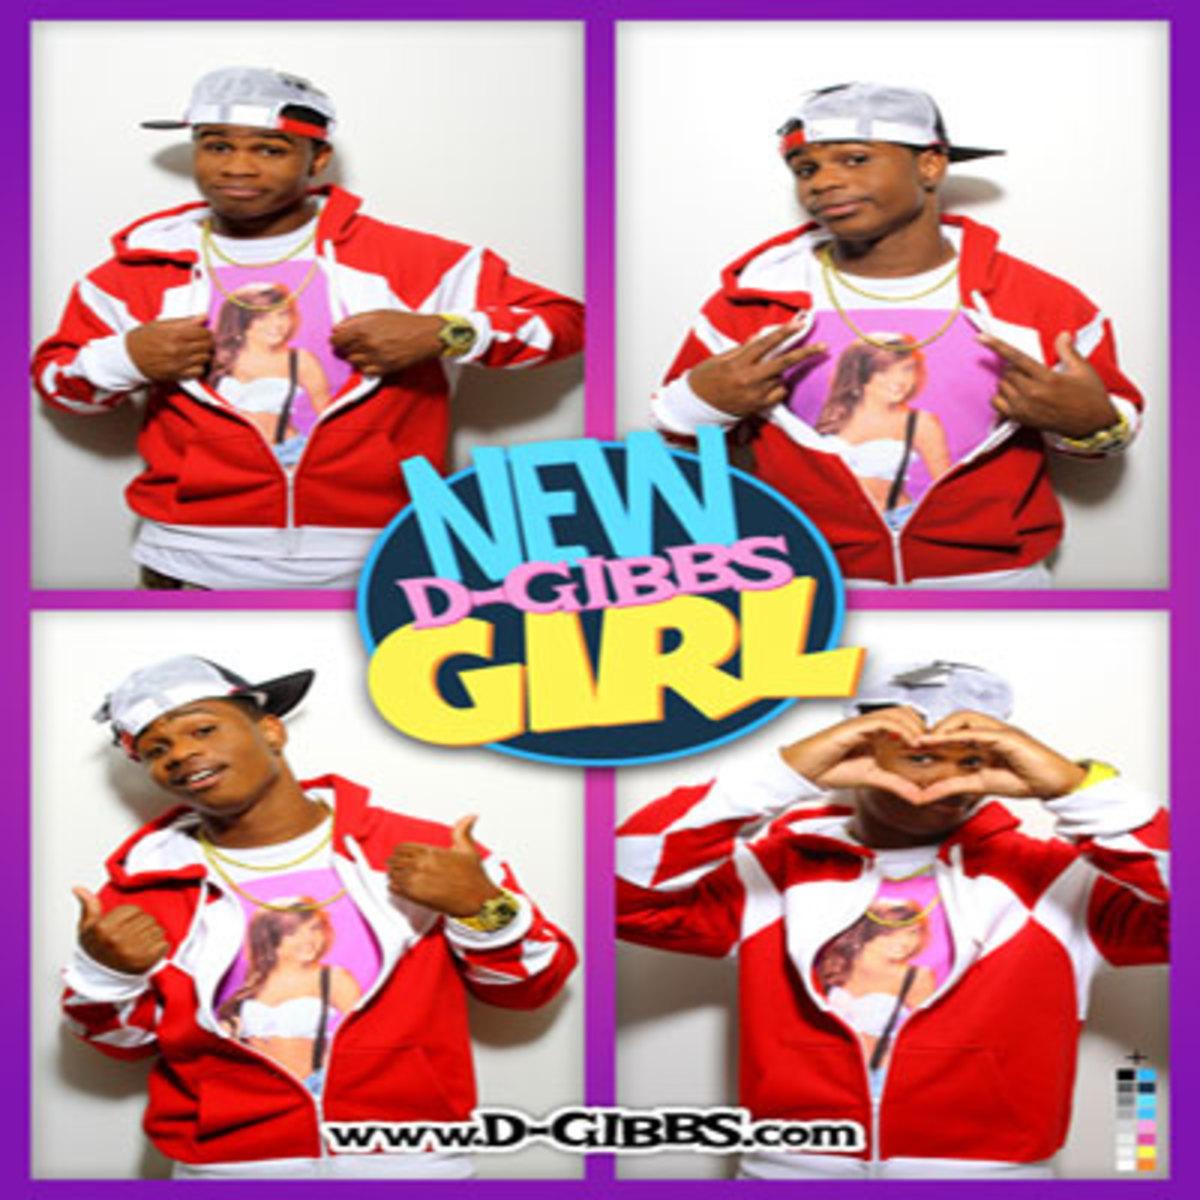 dgibbs-newgirl.jpg